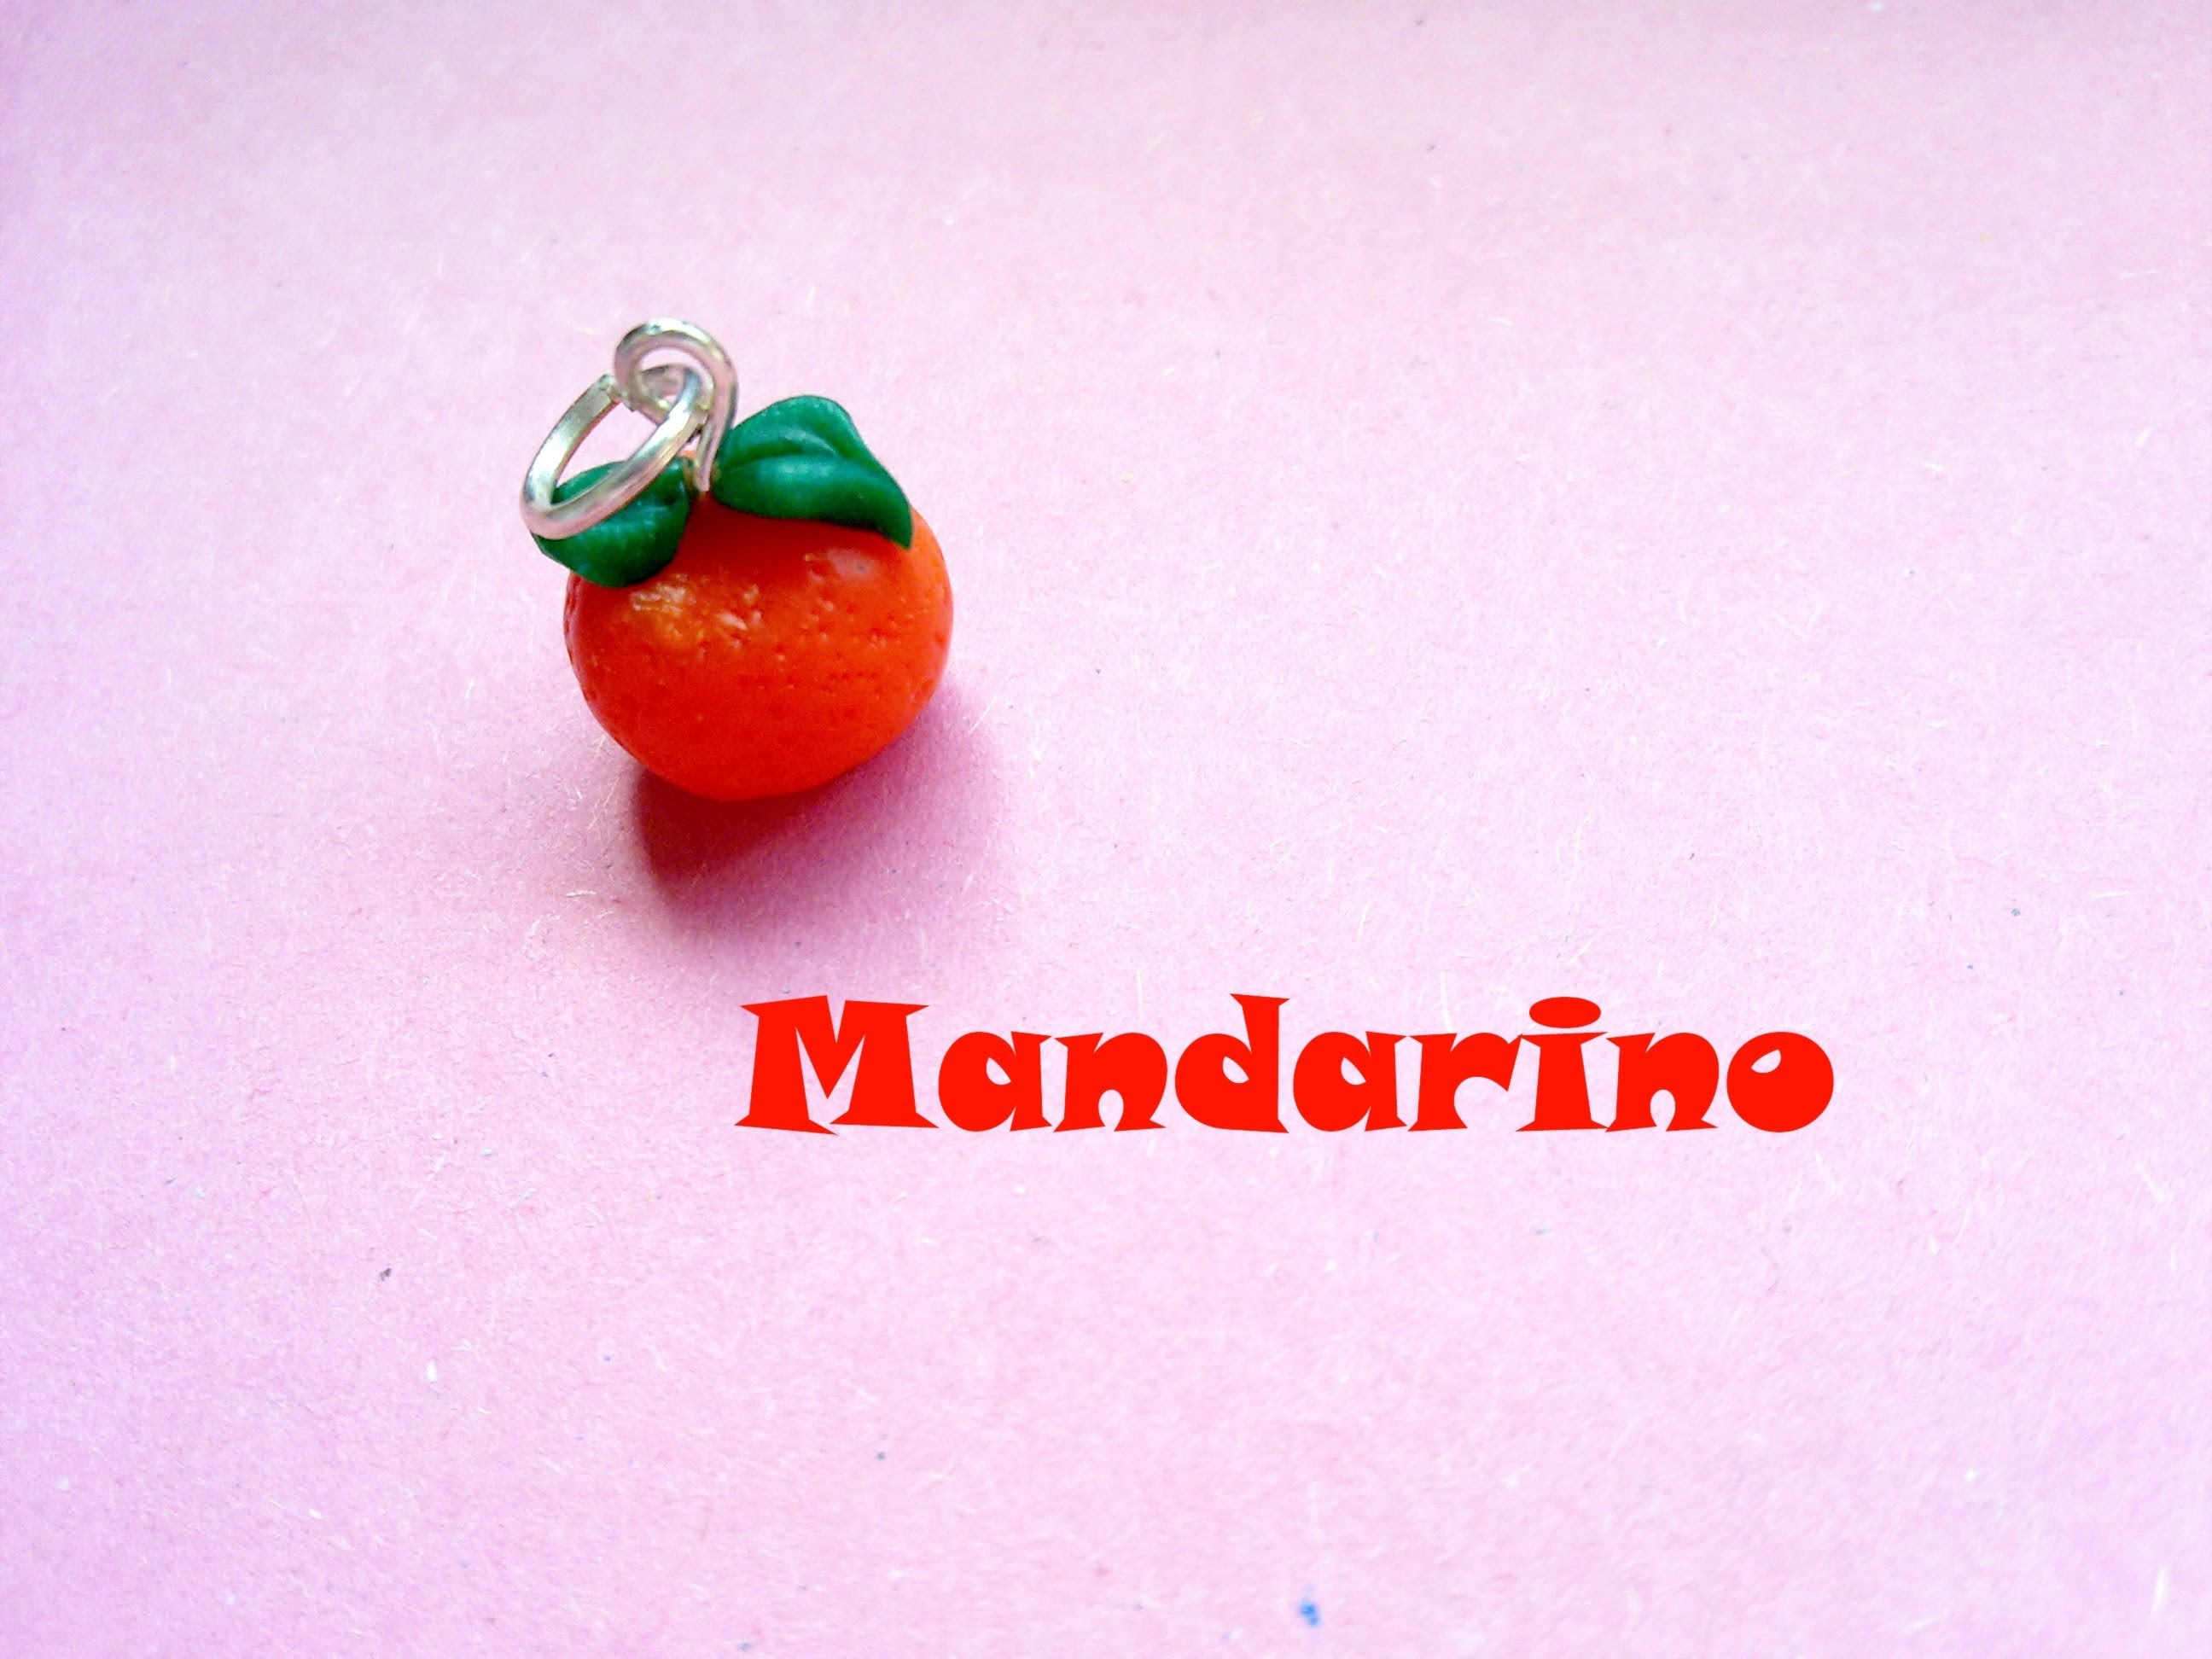 Mandarino (Tangerin, Mandarin) - Polymer Clay Tutorial